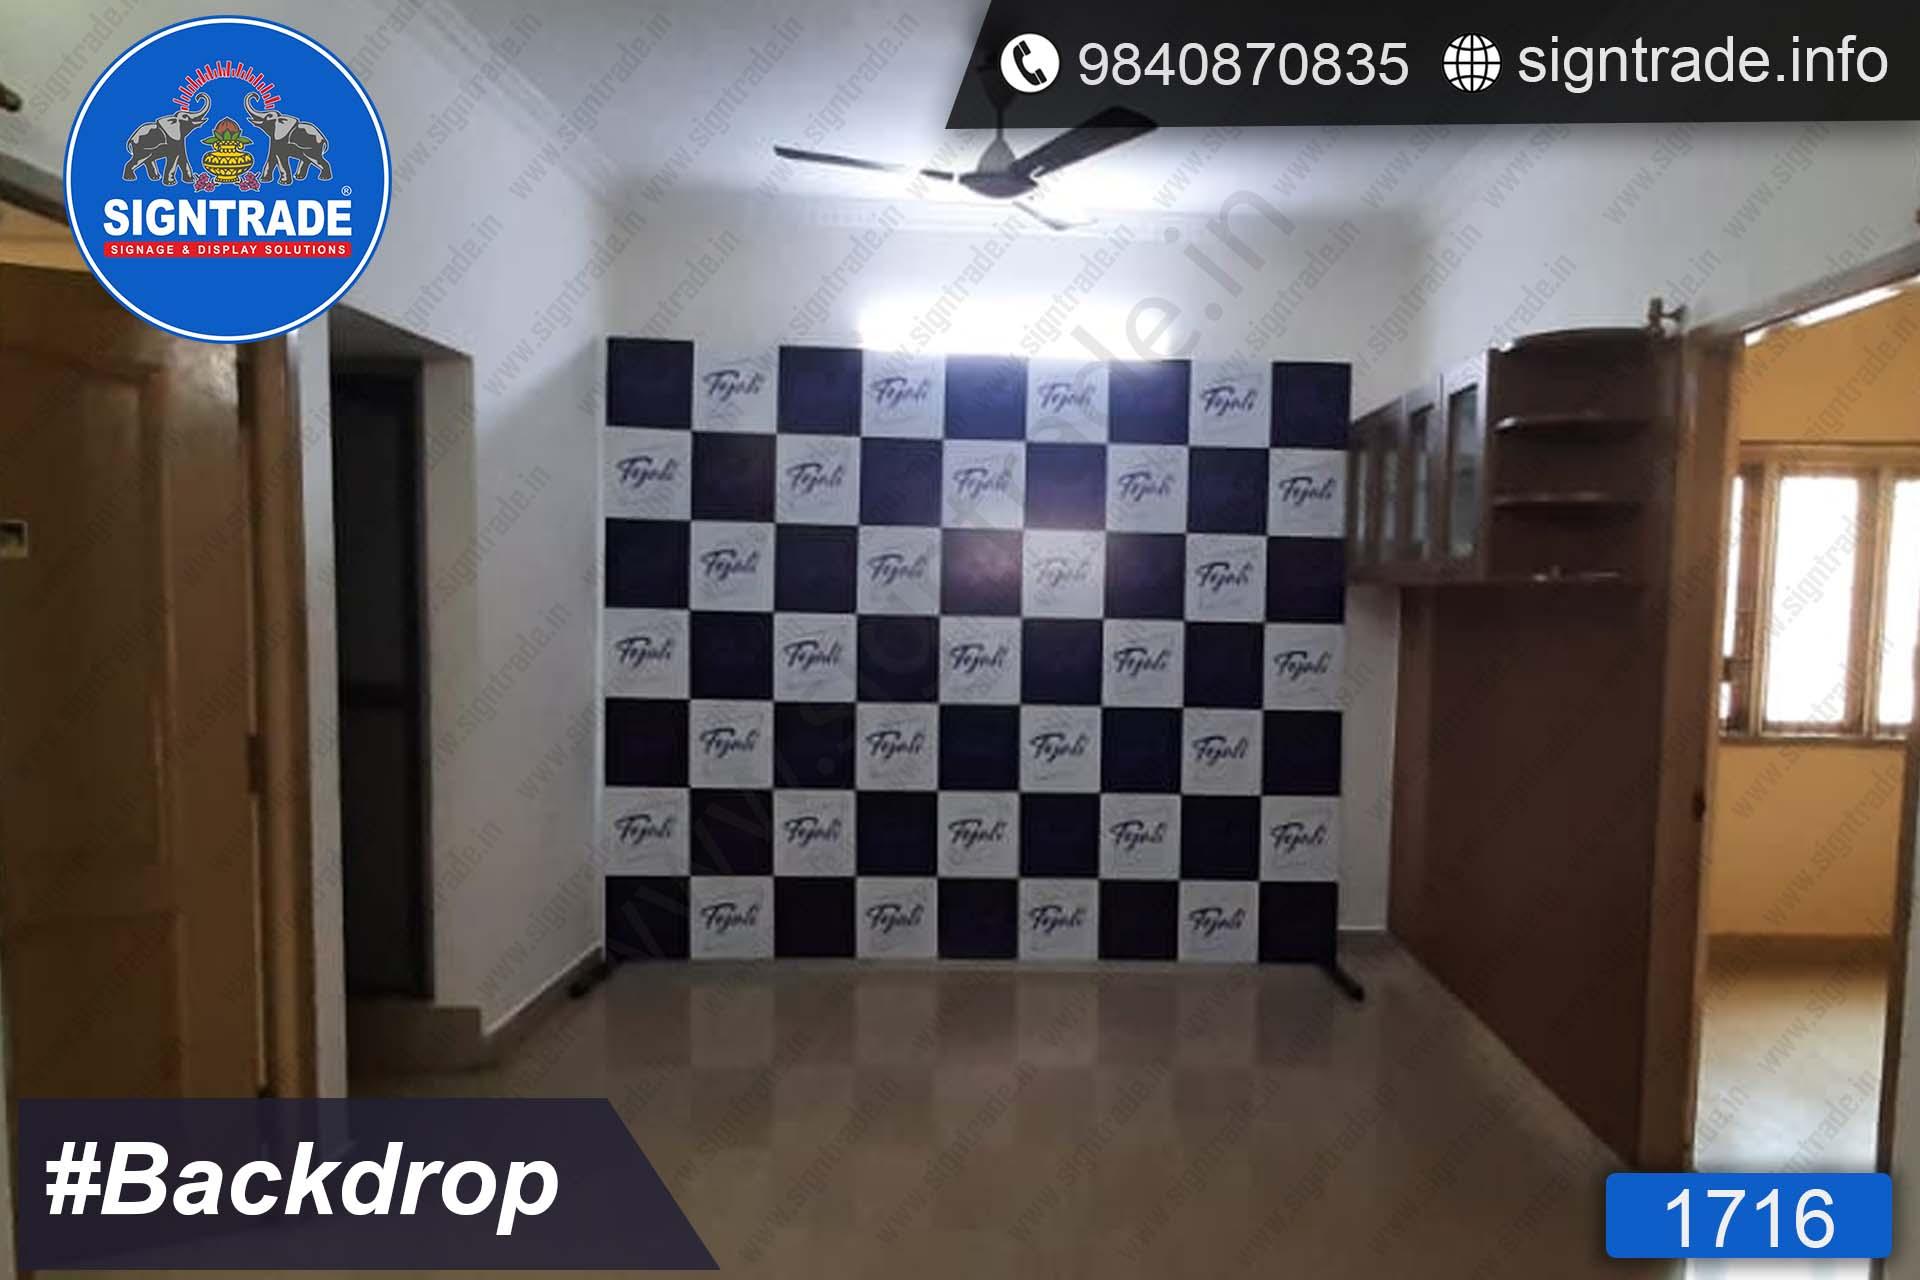 Tejali, Chennai - Backdrop - SIGNTRADE - Backdrop Manufactures in Chennai